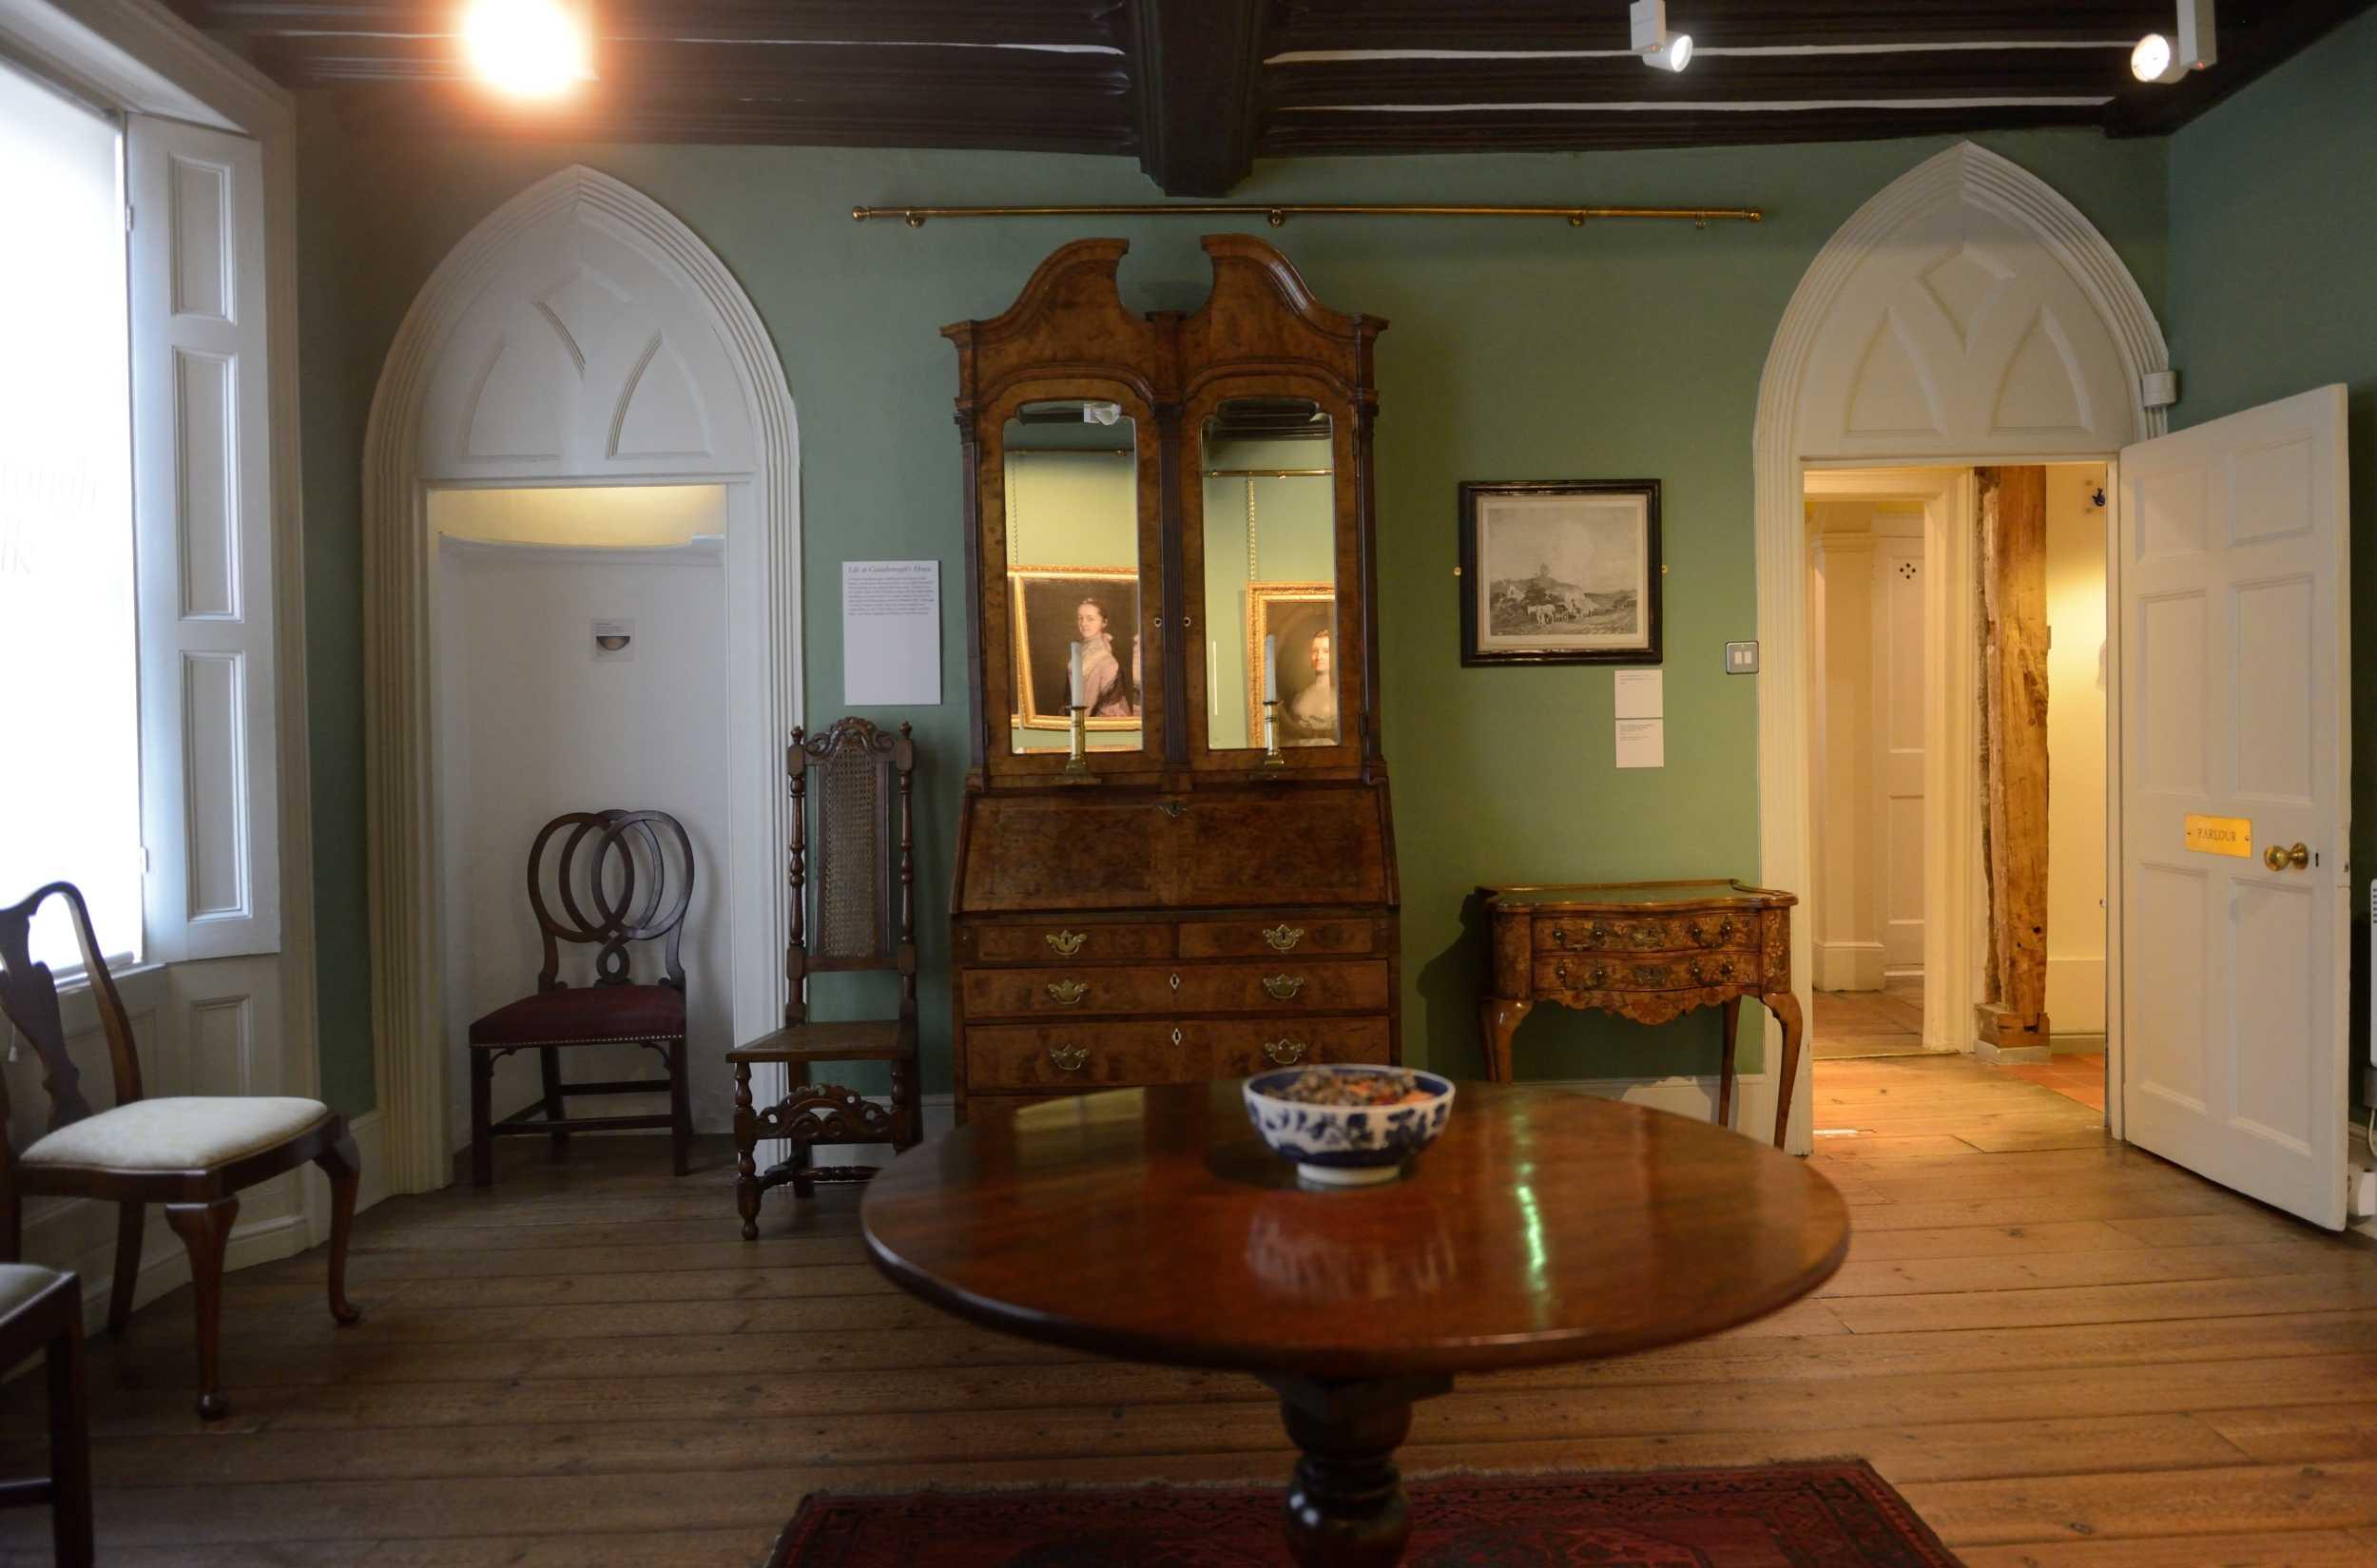 Gainsborough's House, Suffolk, England